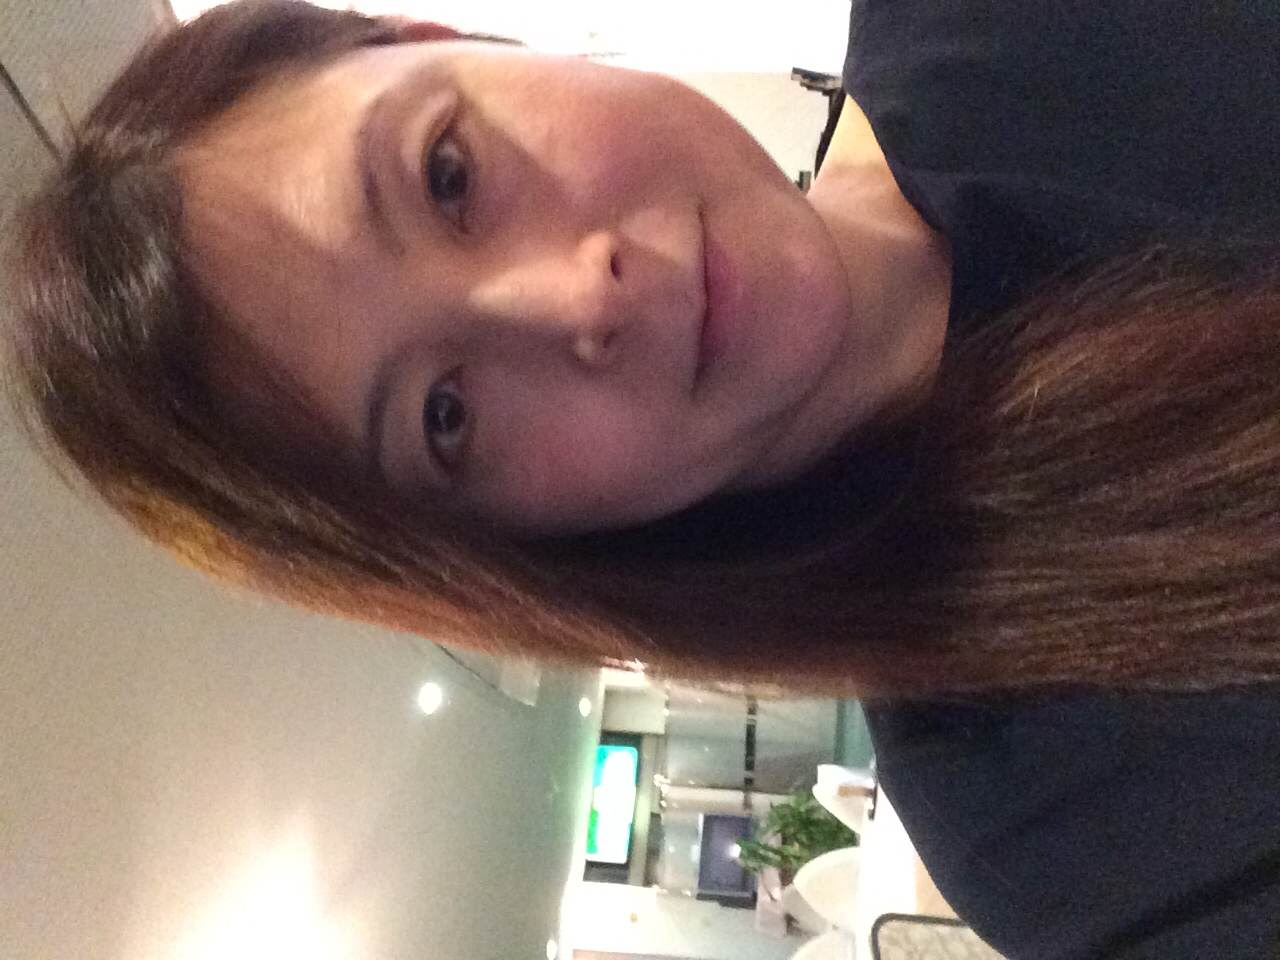 1/2014022613291913-photo-small.jpg